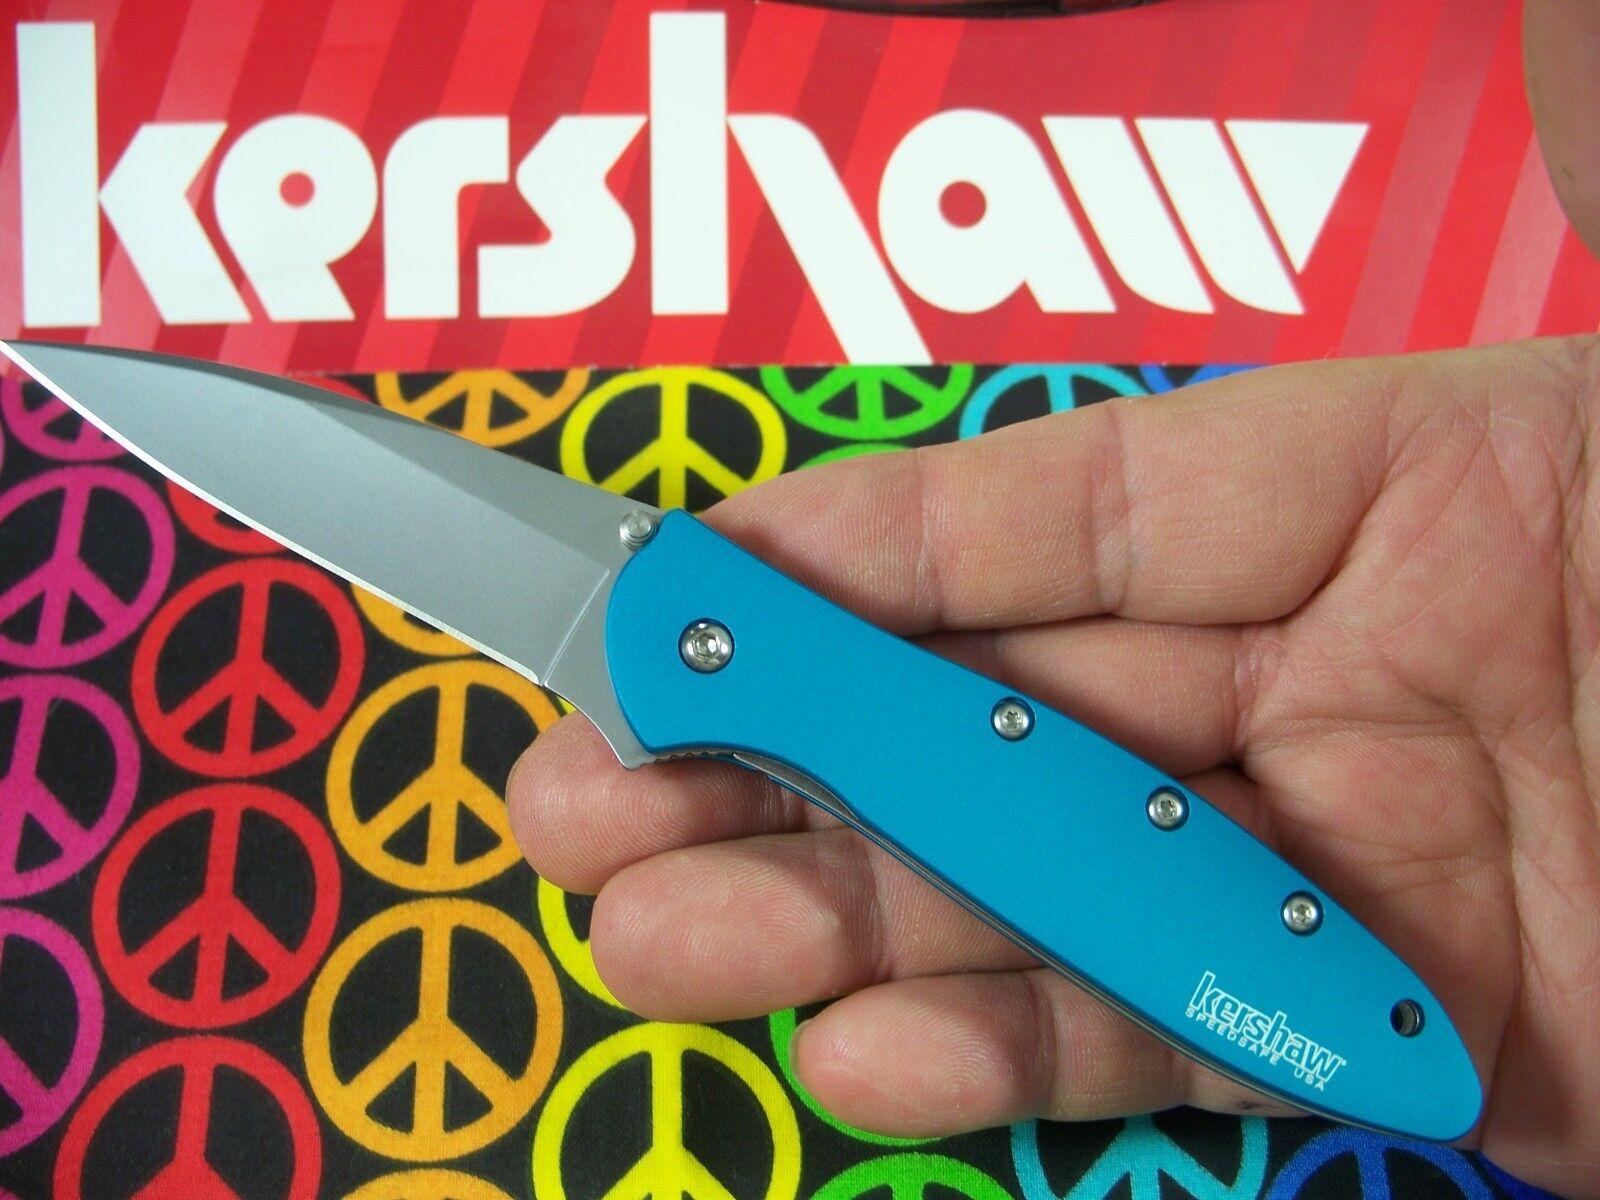 Kershaw \